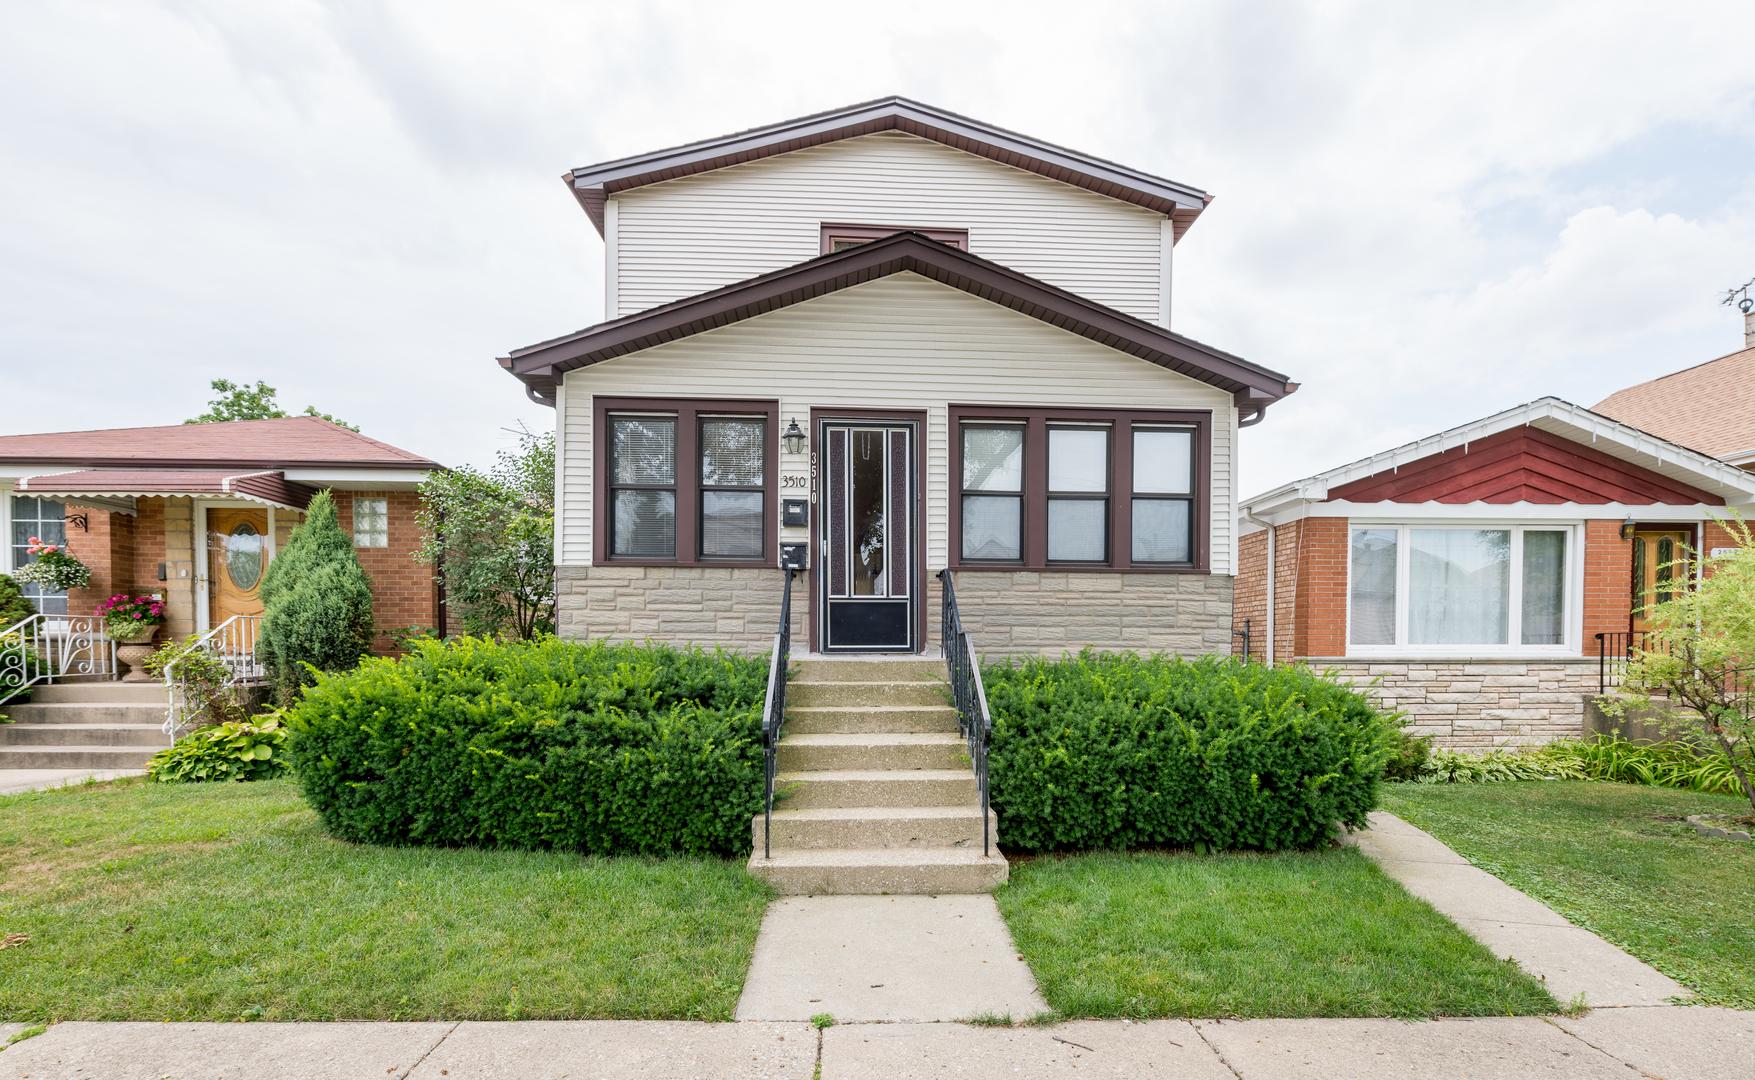 3510 Natoma ,Chicago, Illinois 60634